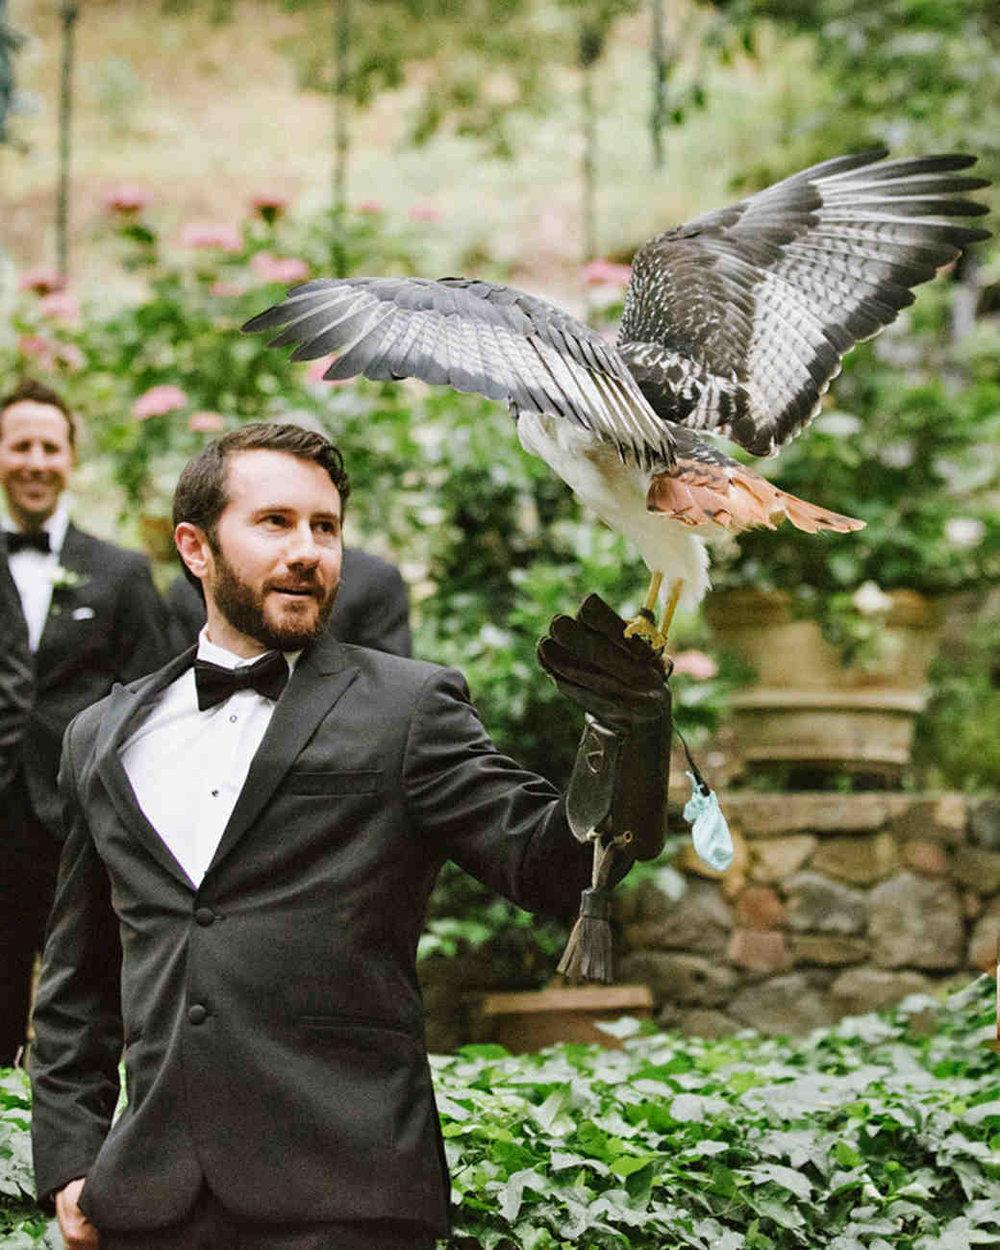 shannon-jon-wedding-hawk-0455-6238579-0117_vert.jpg